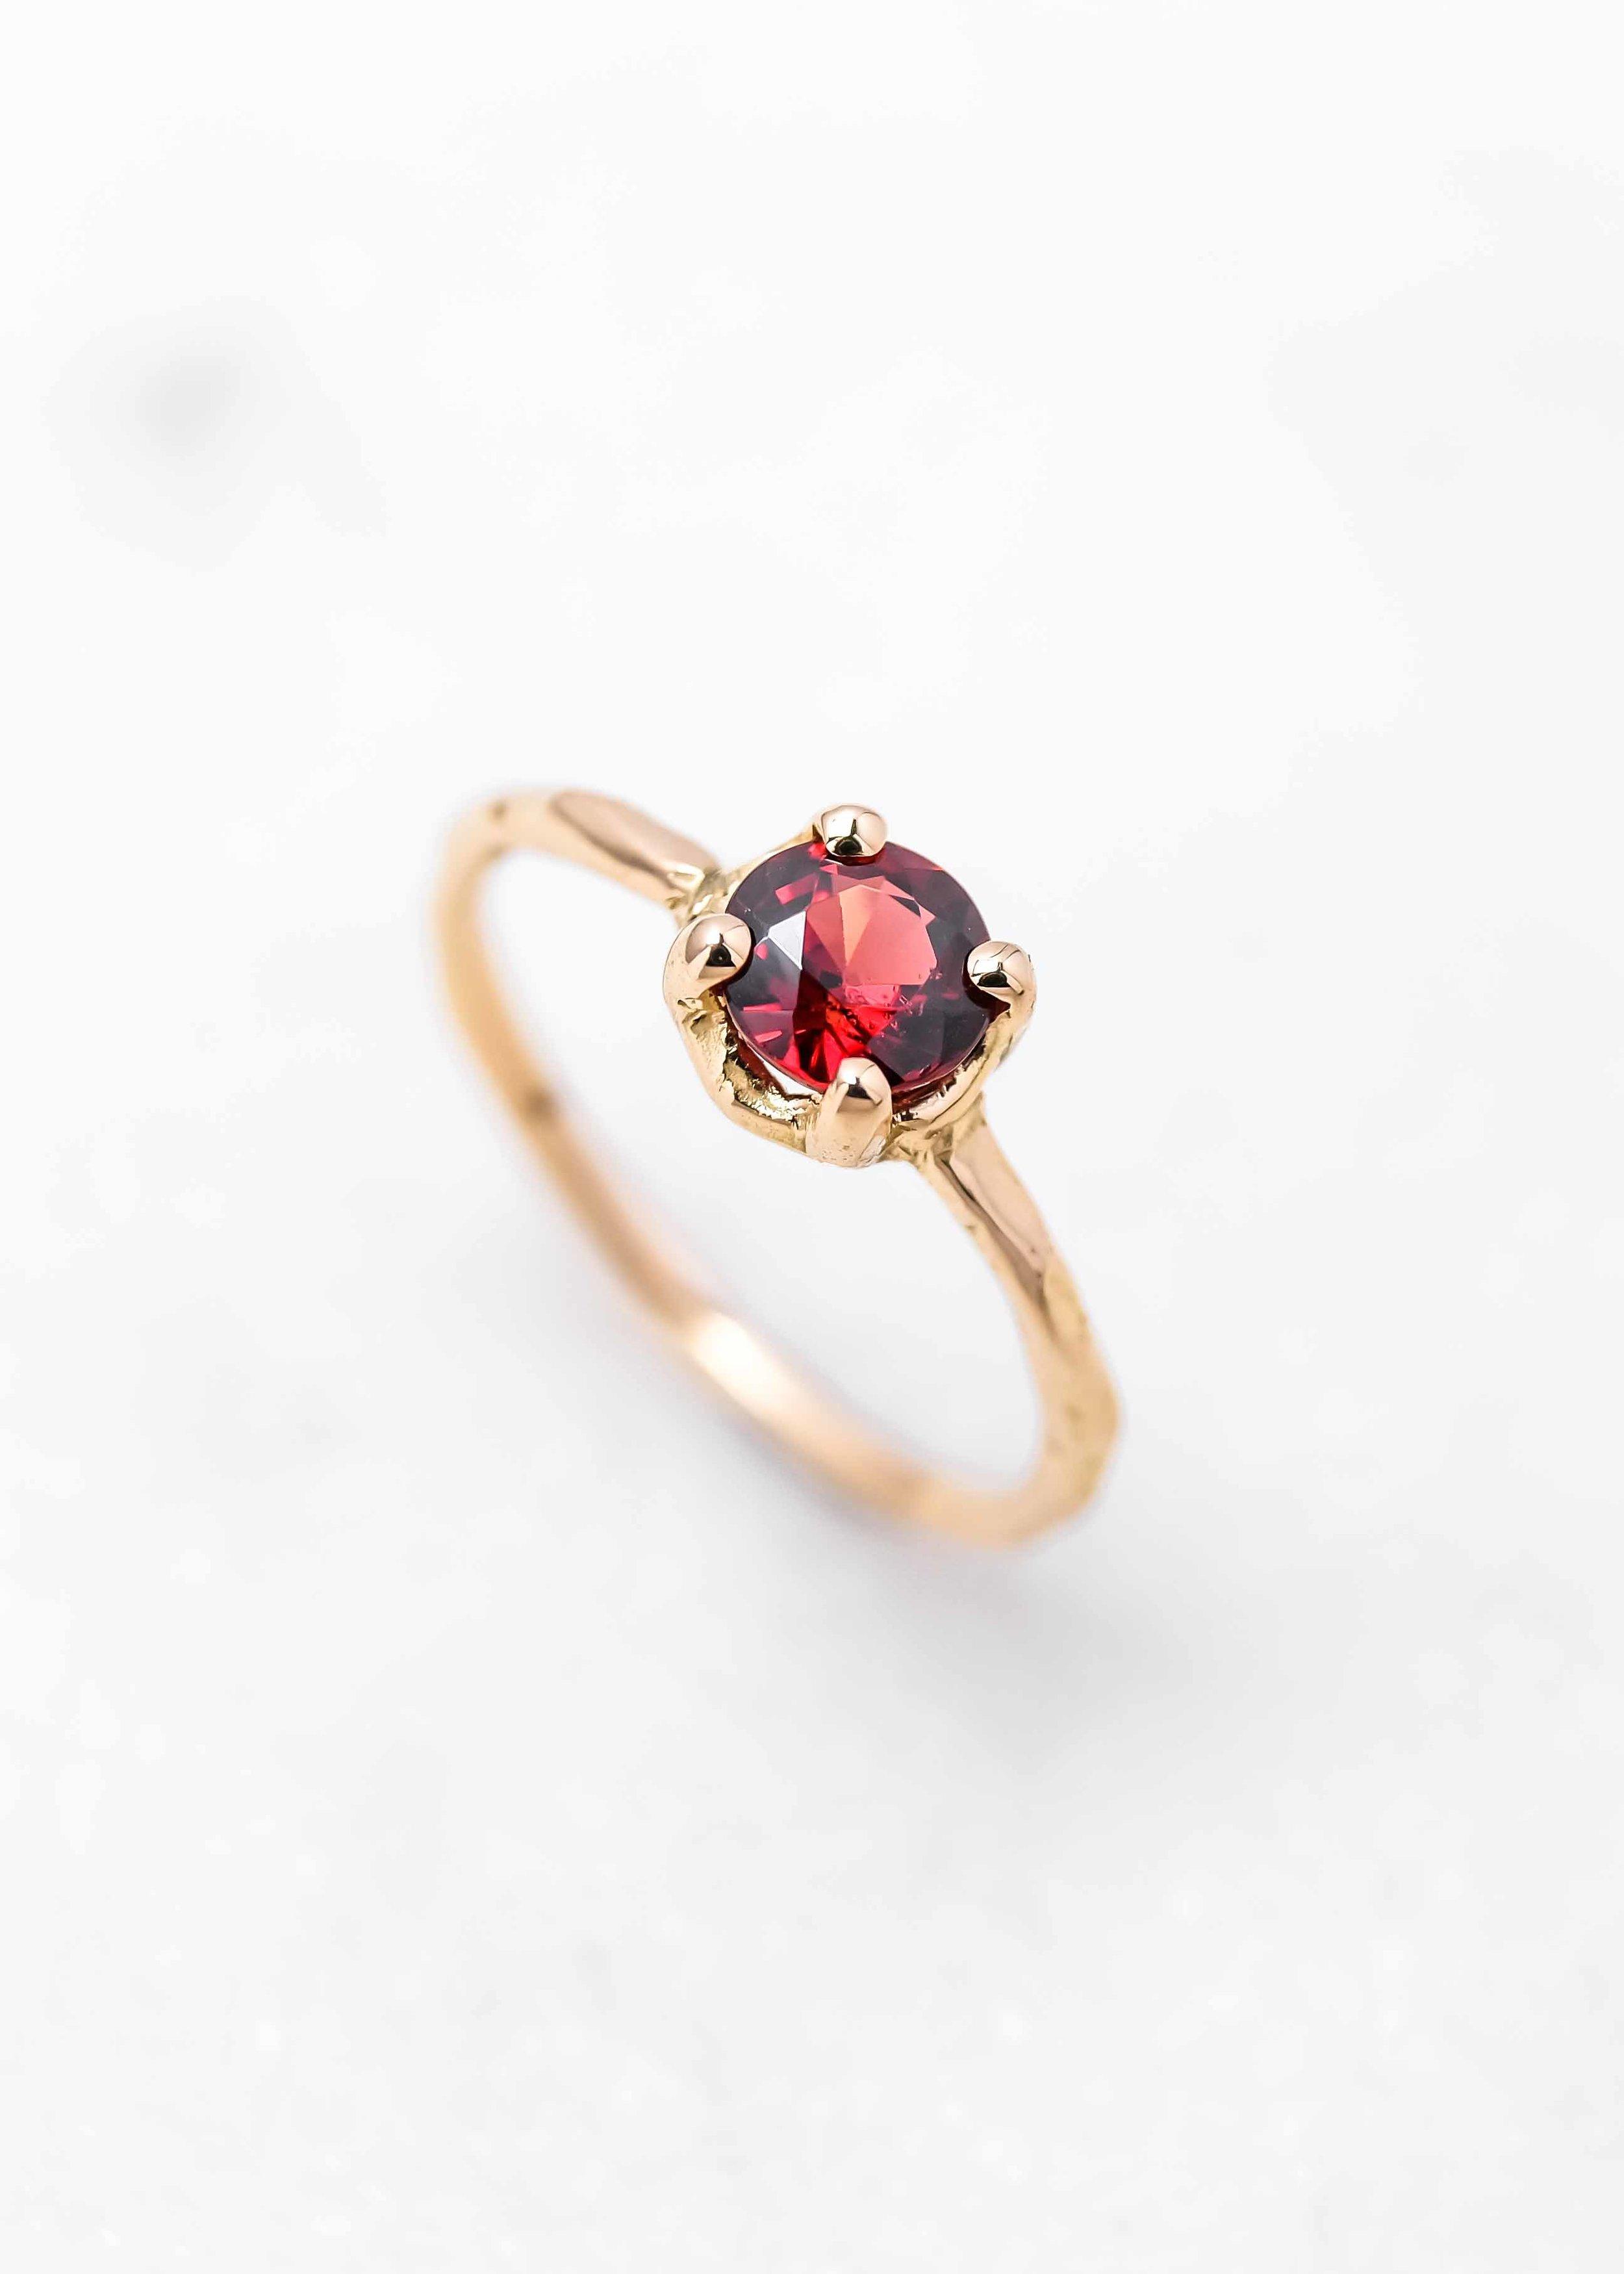 jewelry-wedding-ring-gold-grenat-the-black-alchemy-4.jpg